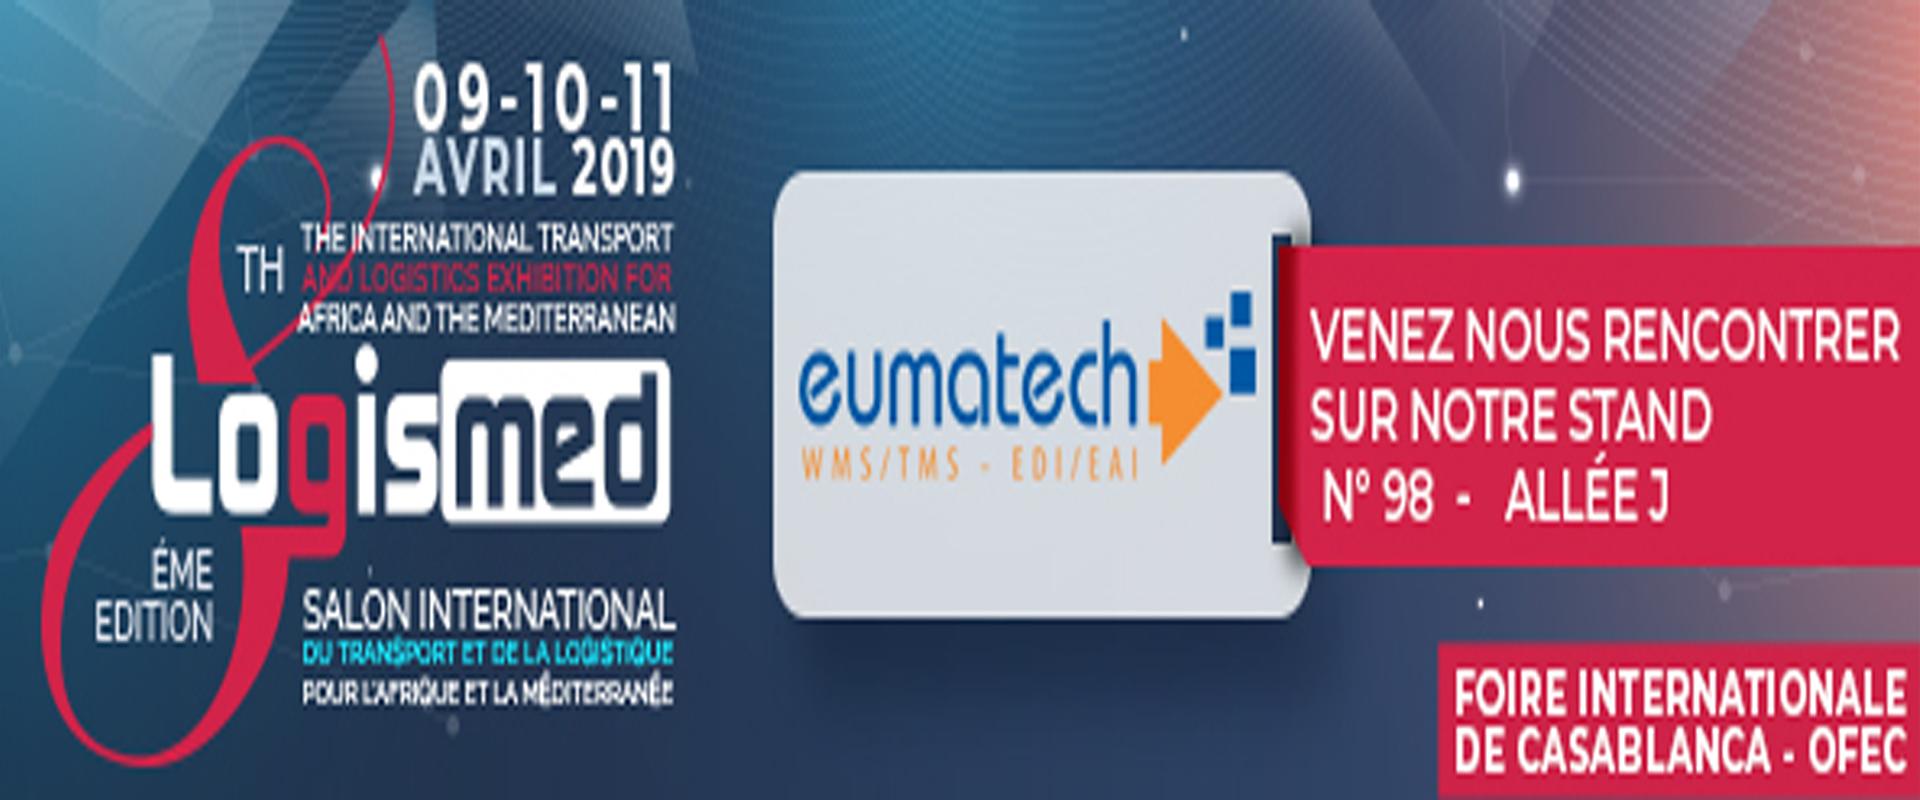 Eumatech participera au salon Logismed 2019